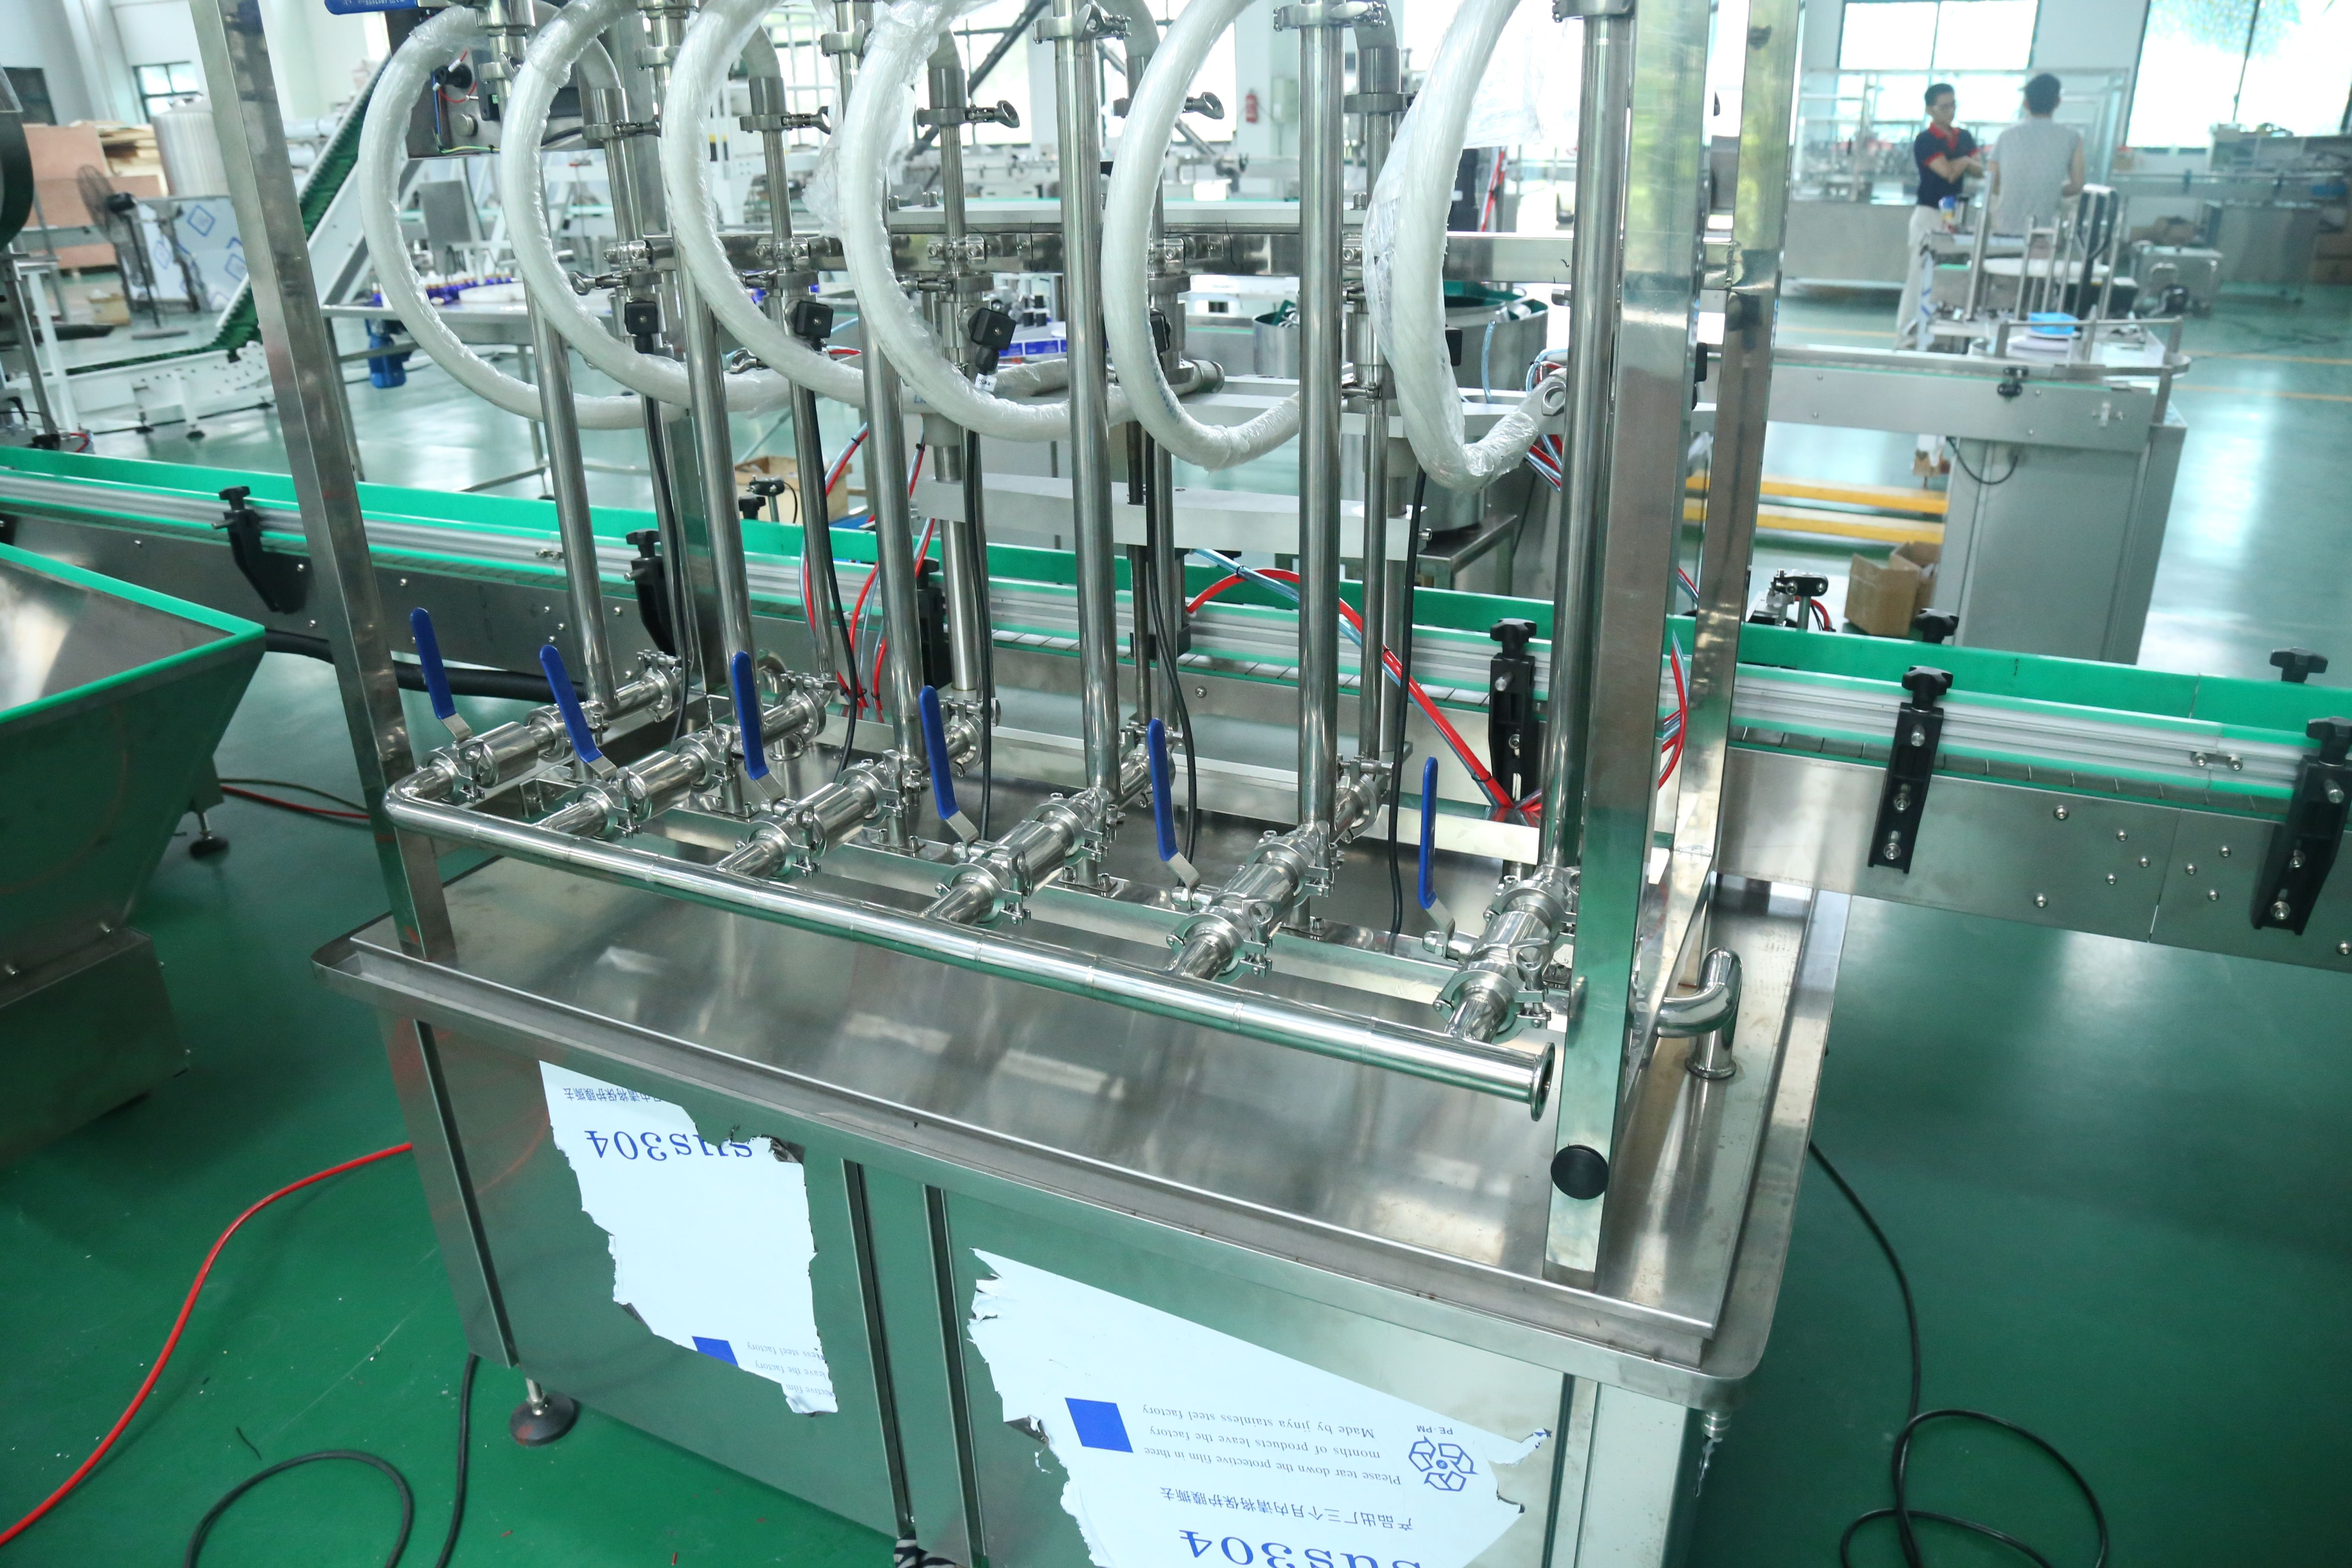 30ml 60ml 100ml Automatic Eliquid Filling Machine E Juice Flavor Filling Machinery Line For Plastic Or Glass Bottle Juice Flavors Small Bottles Liquid Oil